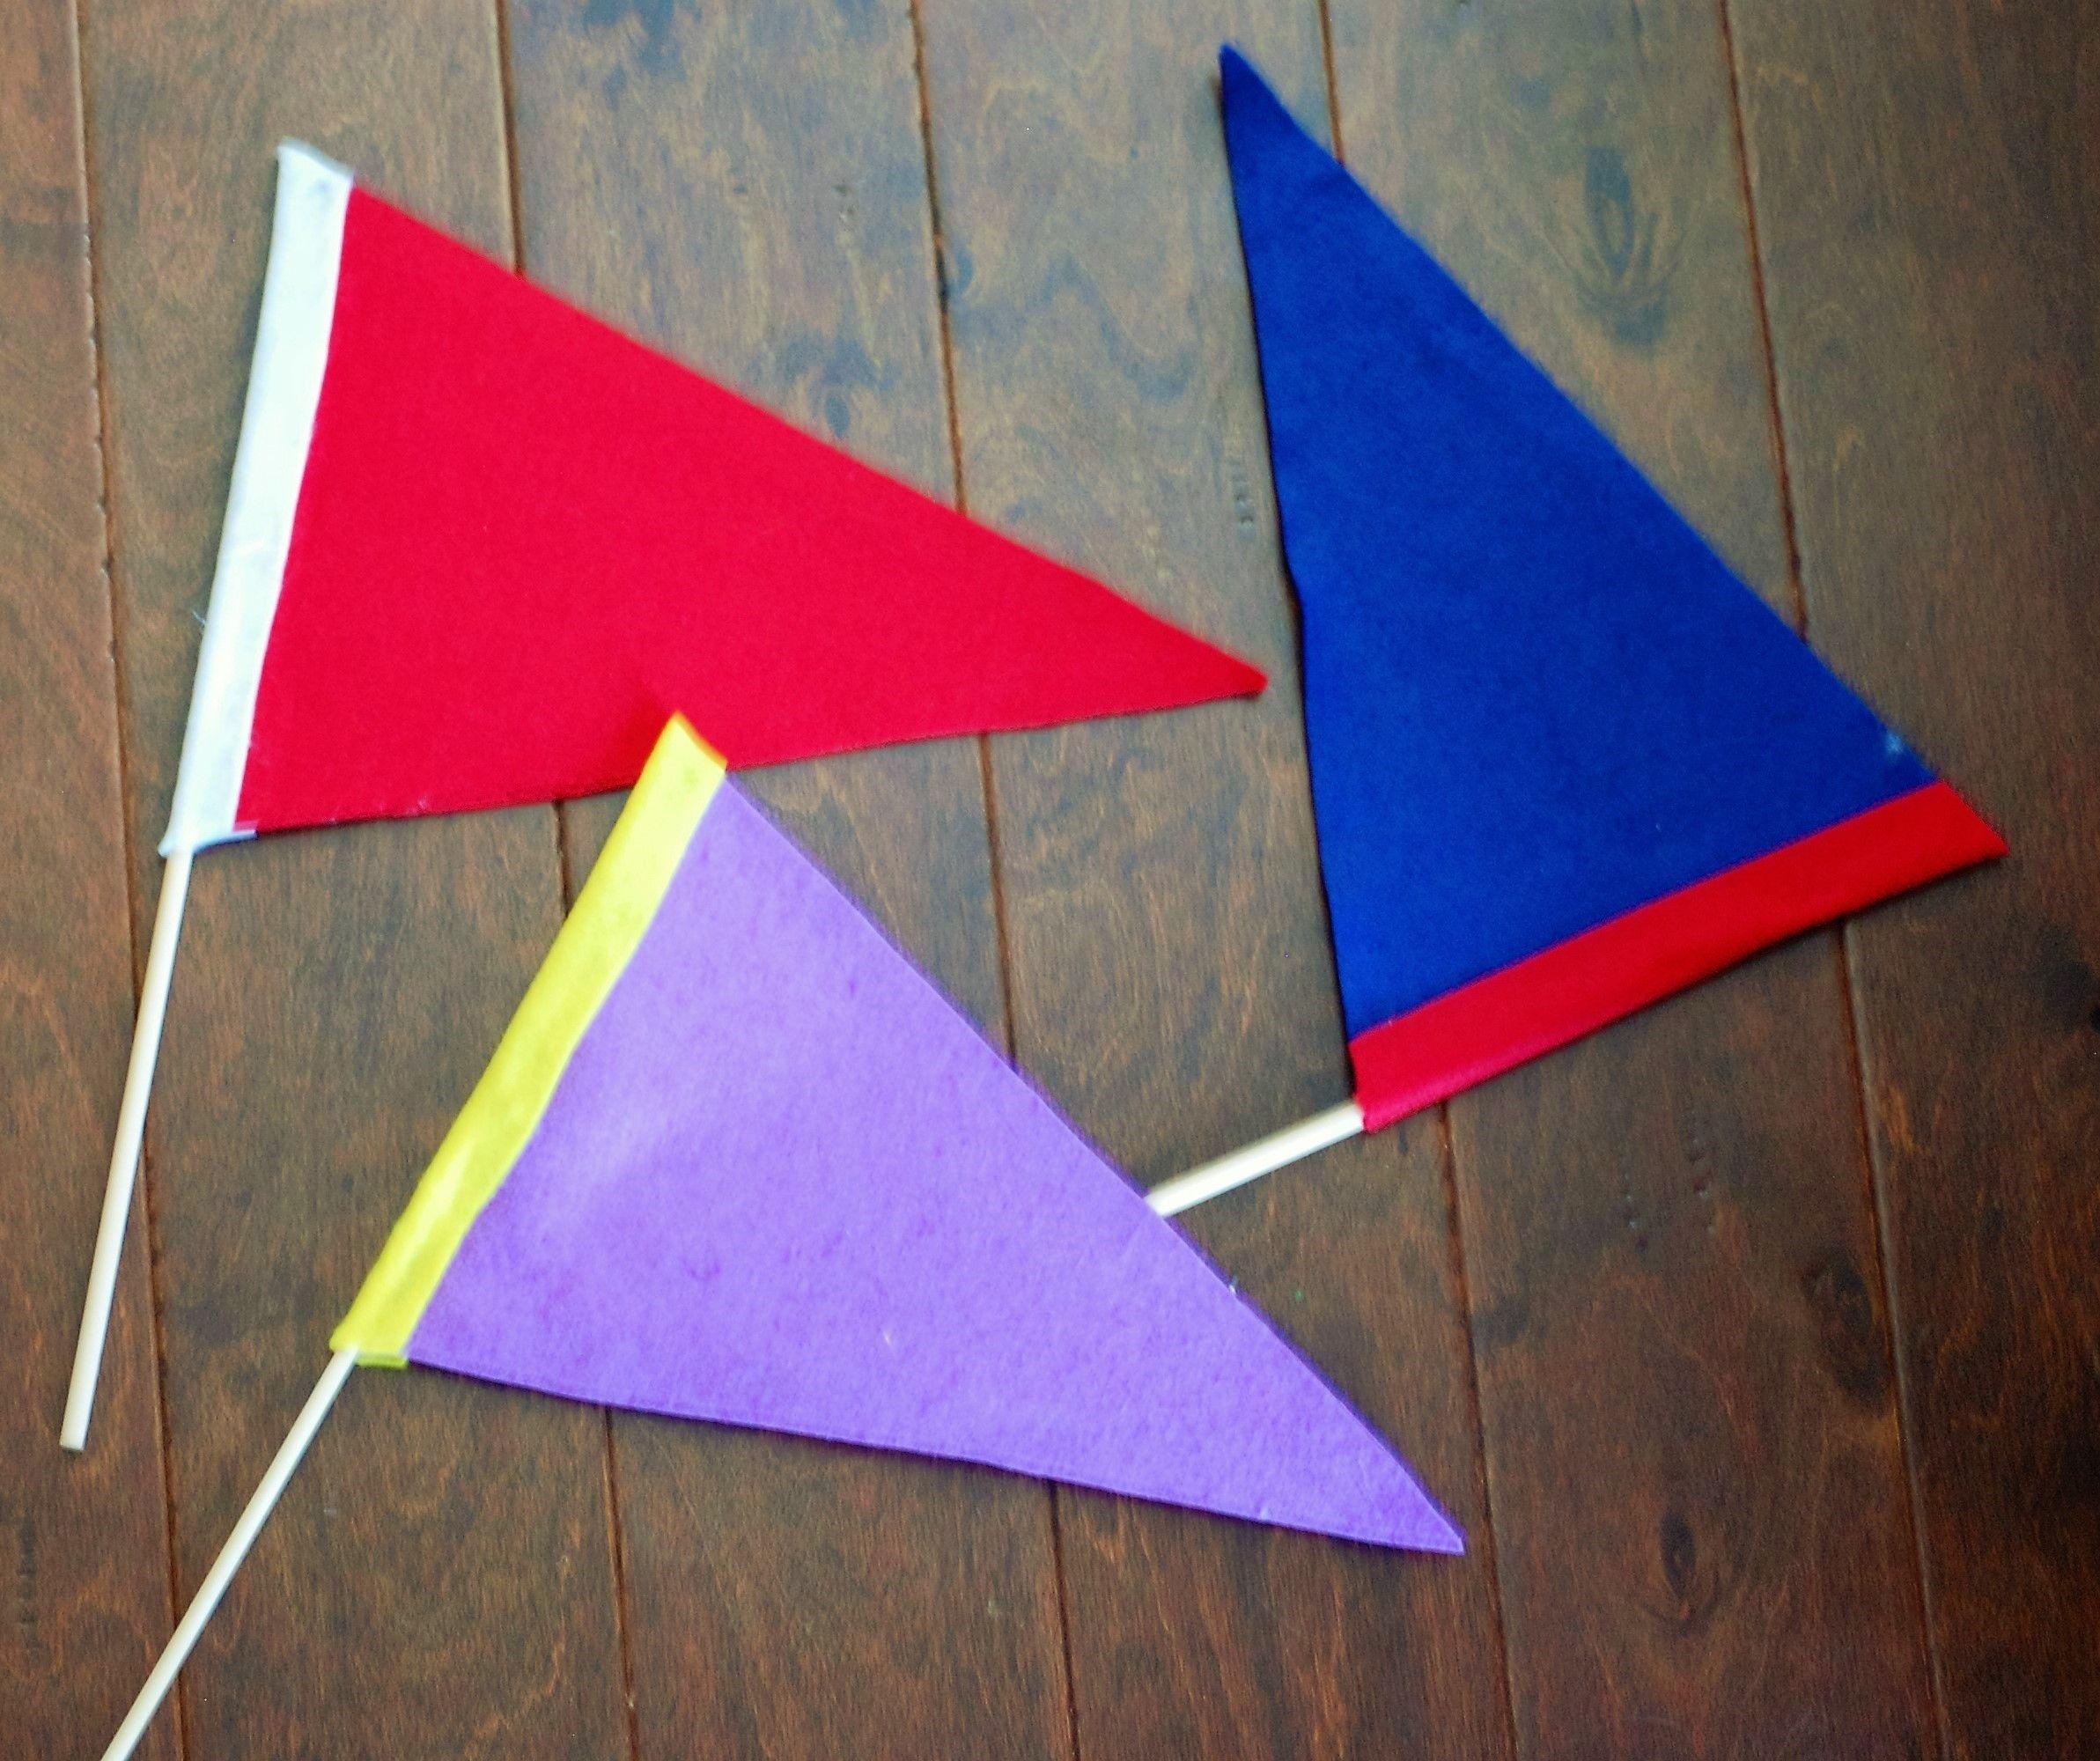 Uncategorized How To Make A Felt Banner diy felt pennant team flags and felting flags